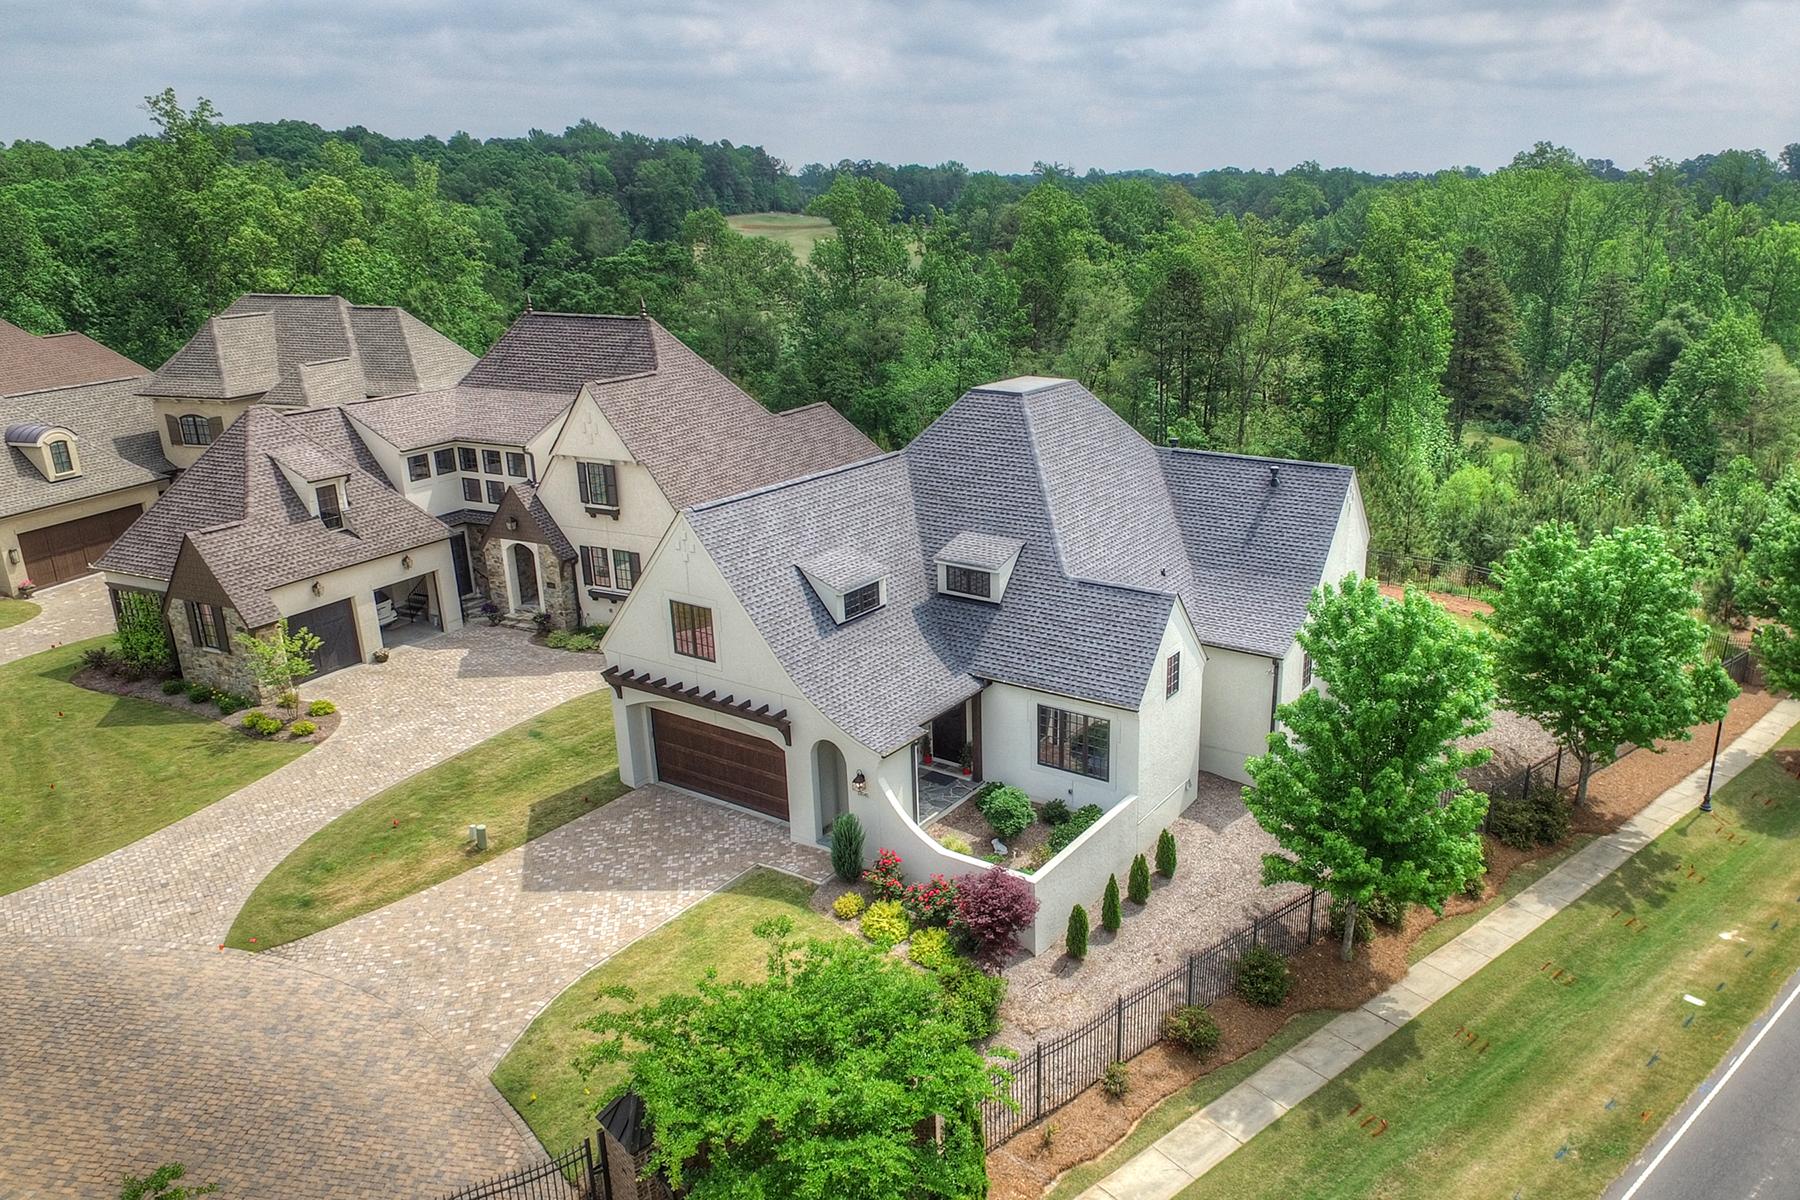 Single Family Home for Sale at 13545 Grand Palisades Pkwy , Charlotte, NC 28278 13545 Grand Palisades Pkwy Charlotte, North Carolina, 28278 United States